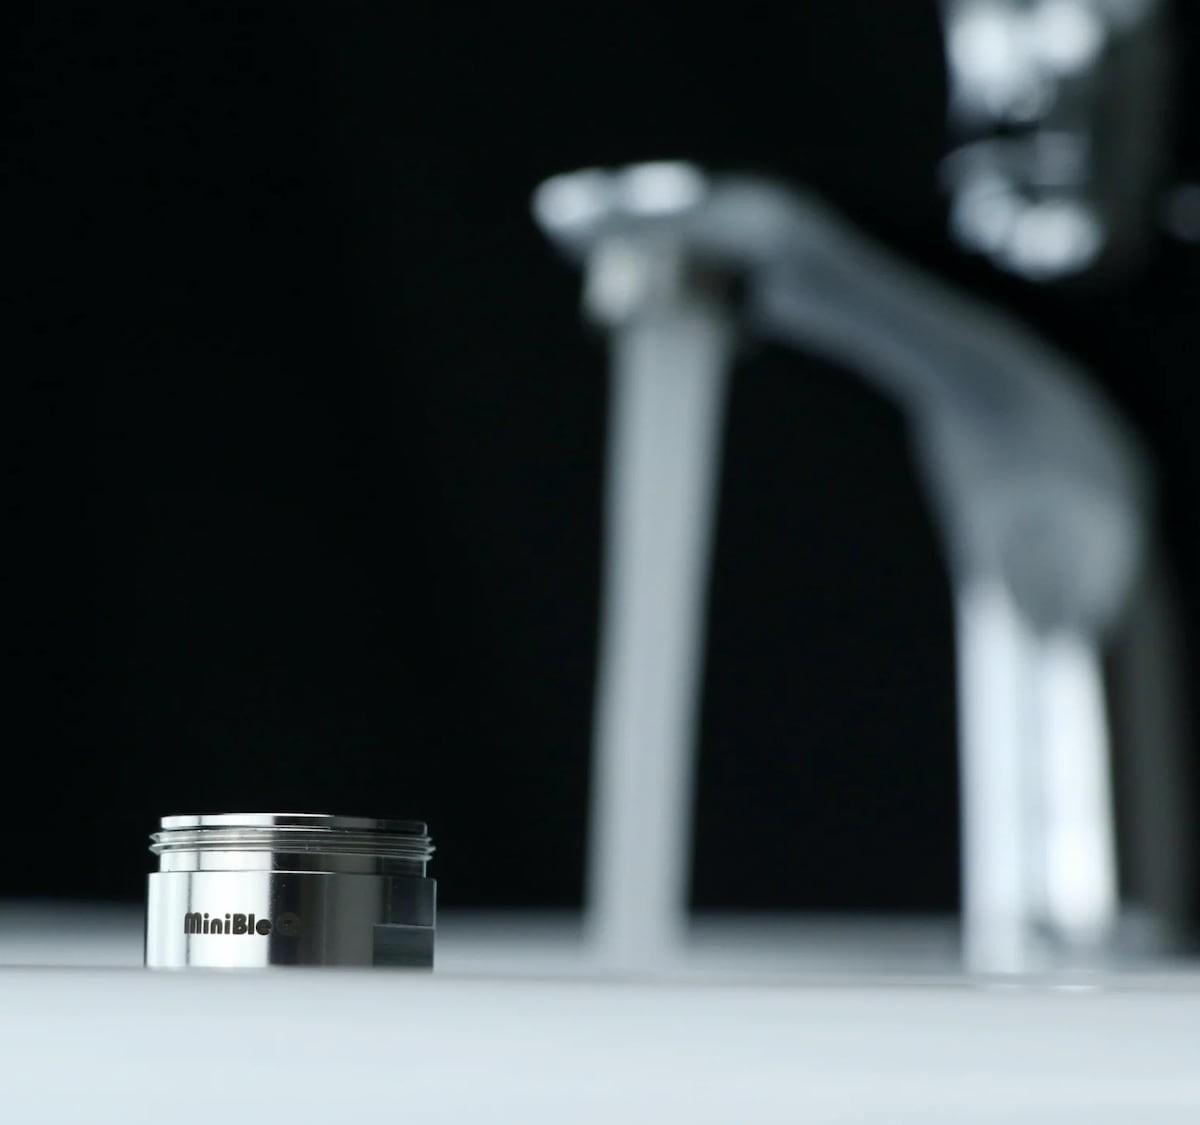 MiniBle Q tiny microbubble aerator creates up to 600 million microbubbles